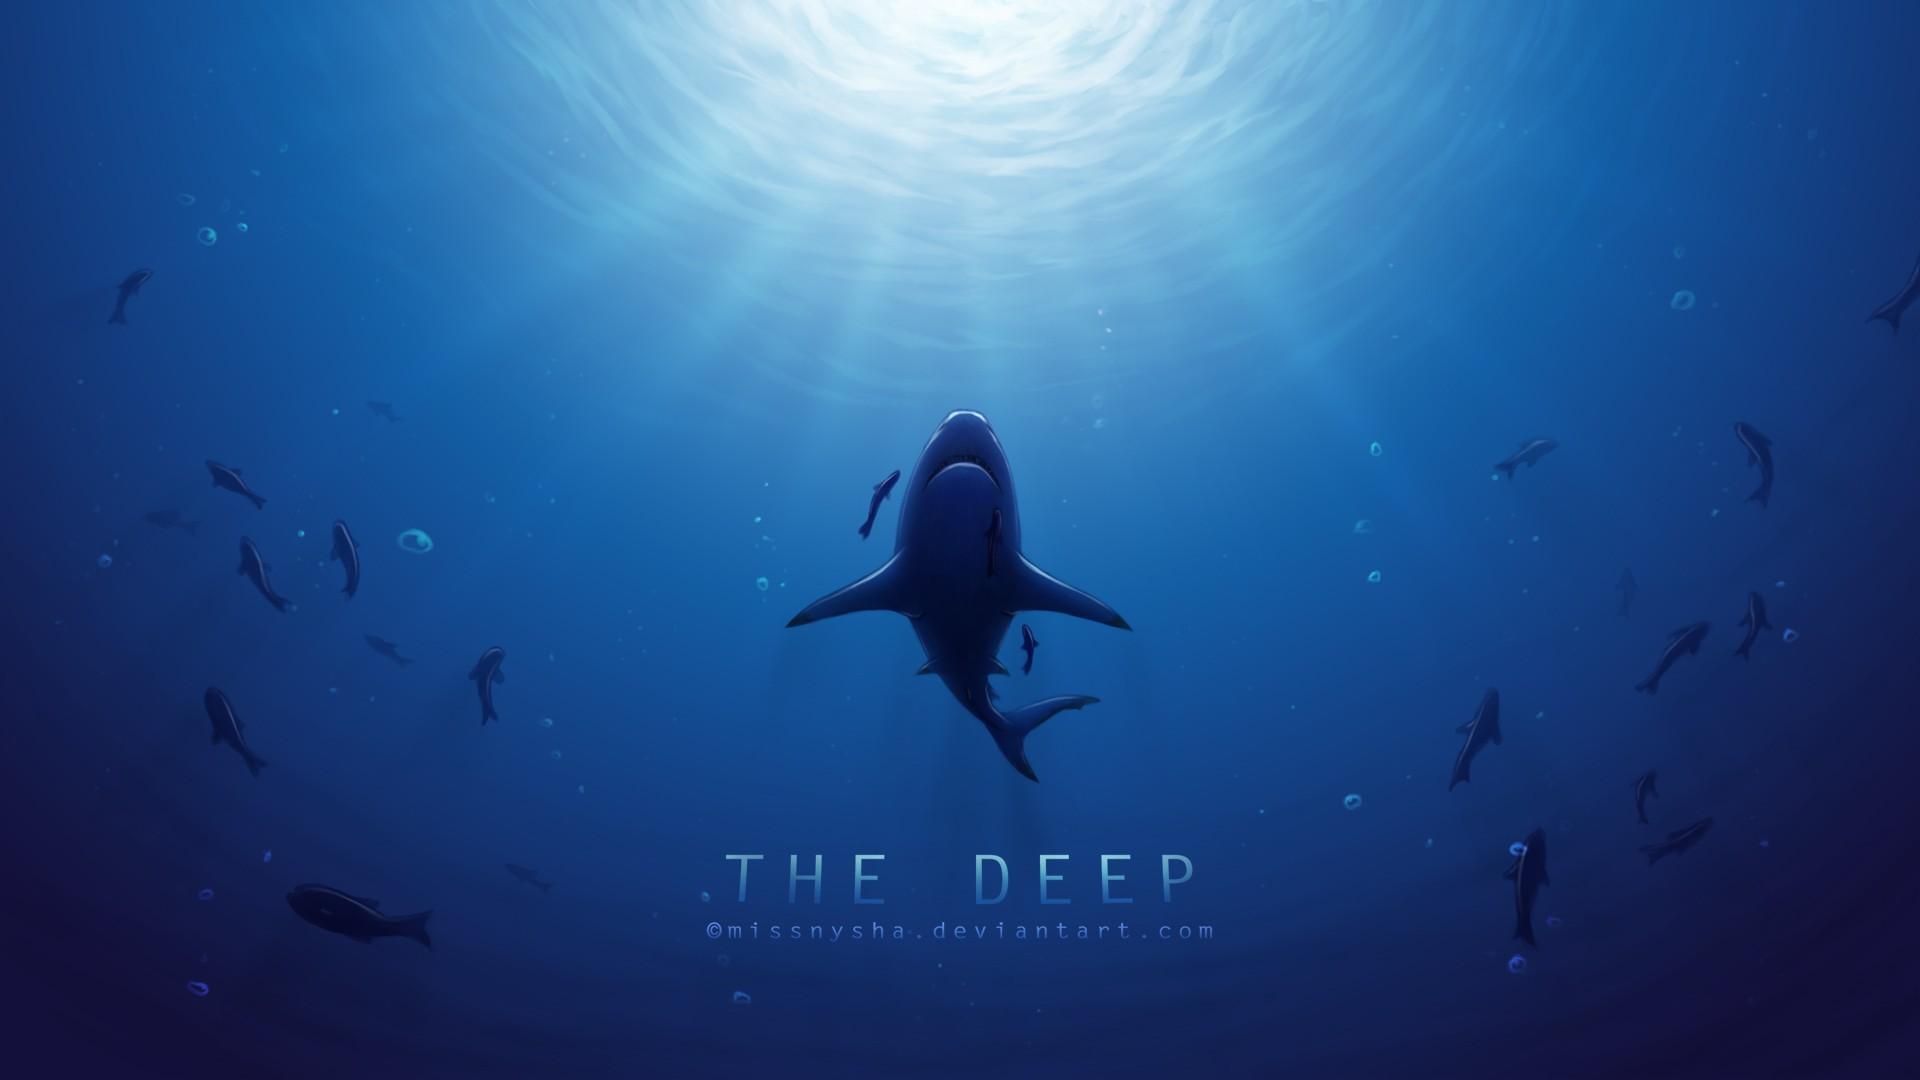 Deep Sea Wallpaper 1920x1080 Deep Sea Sharp 1920x1080